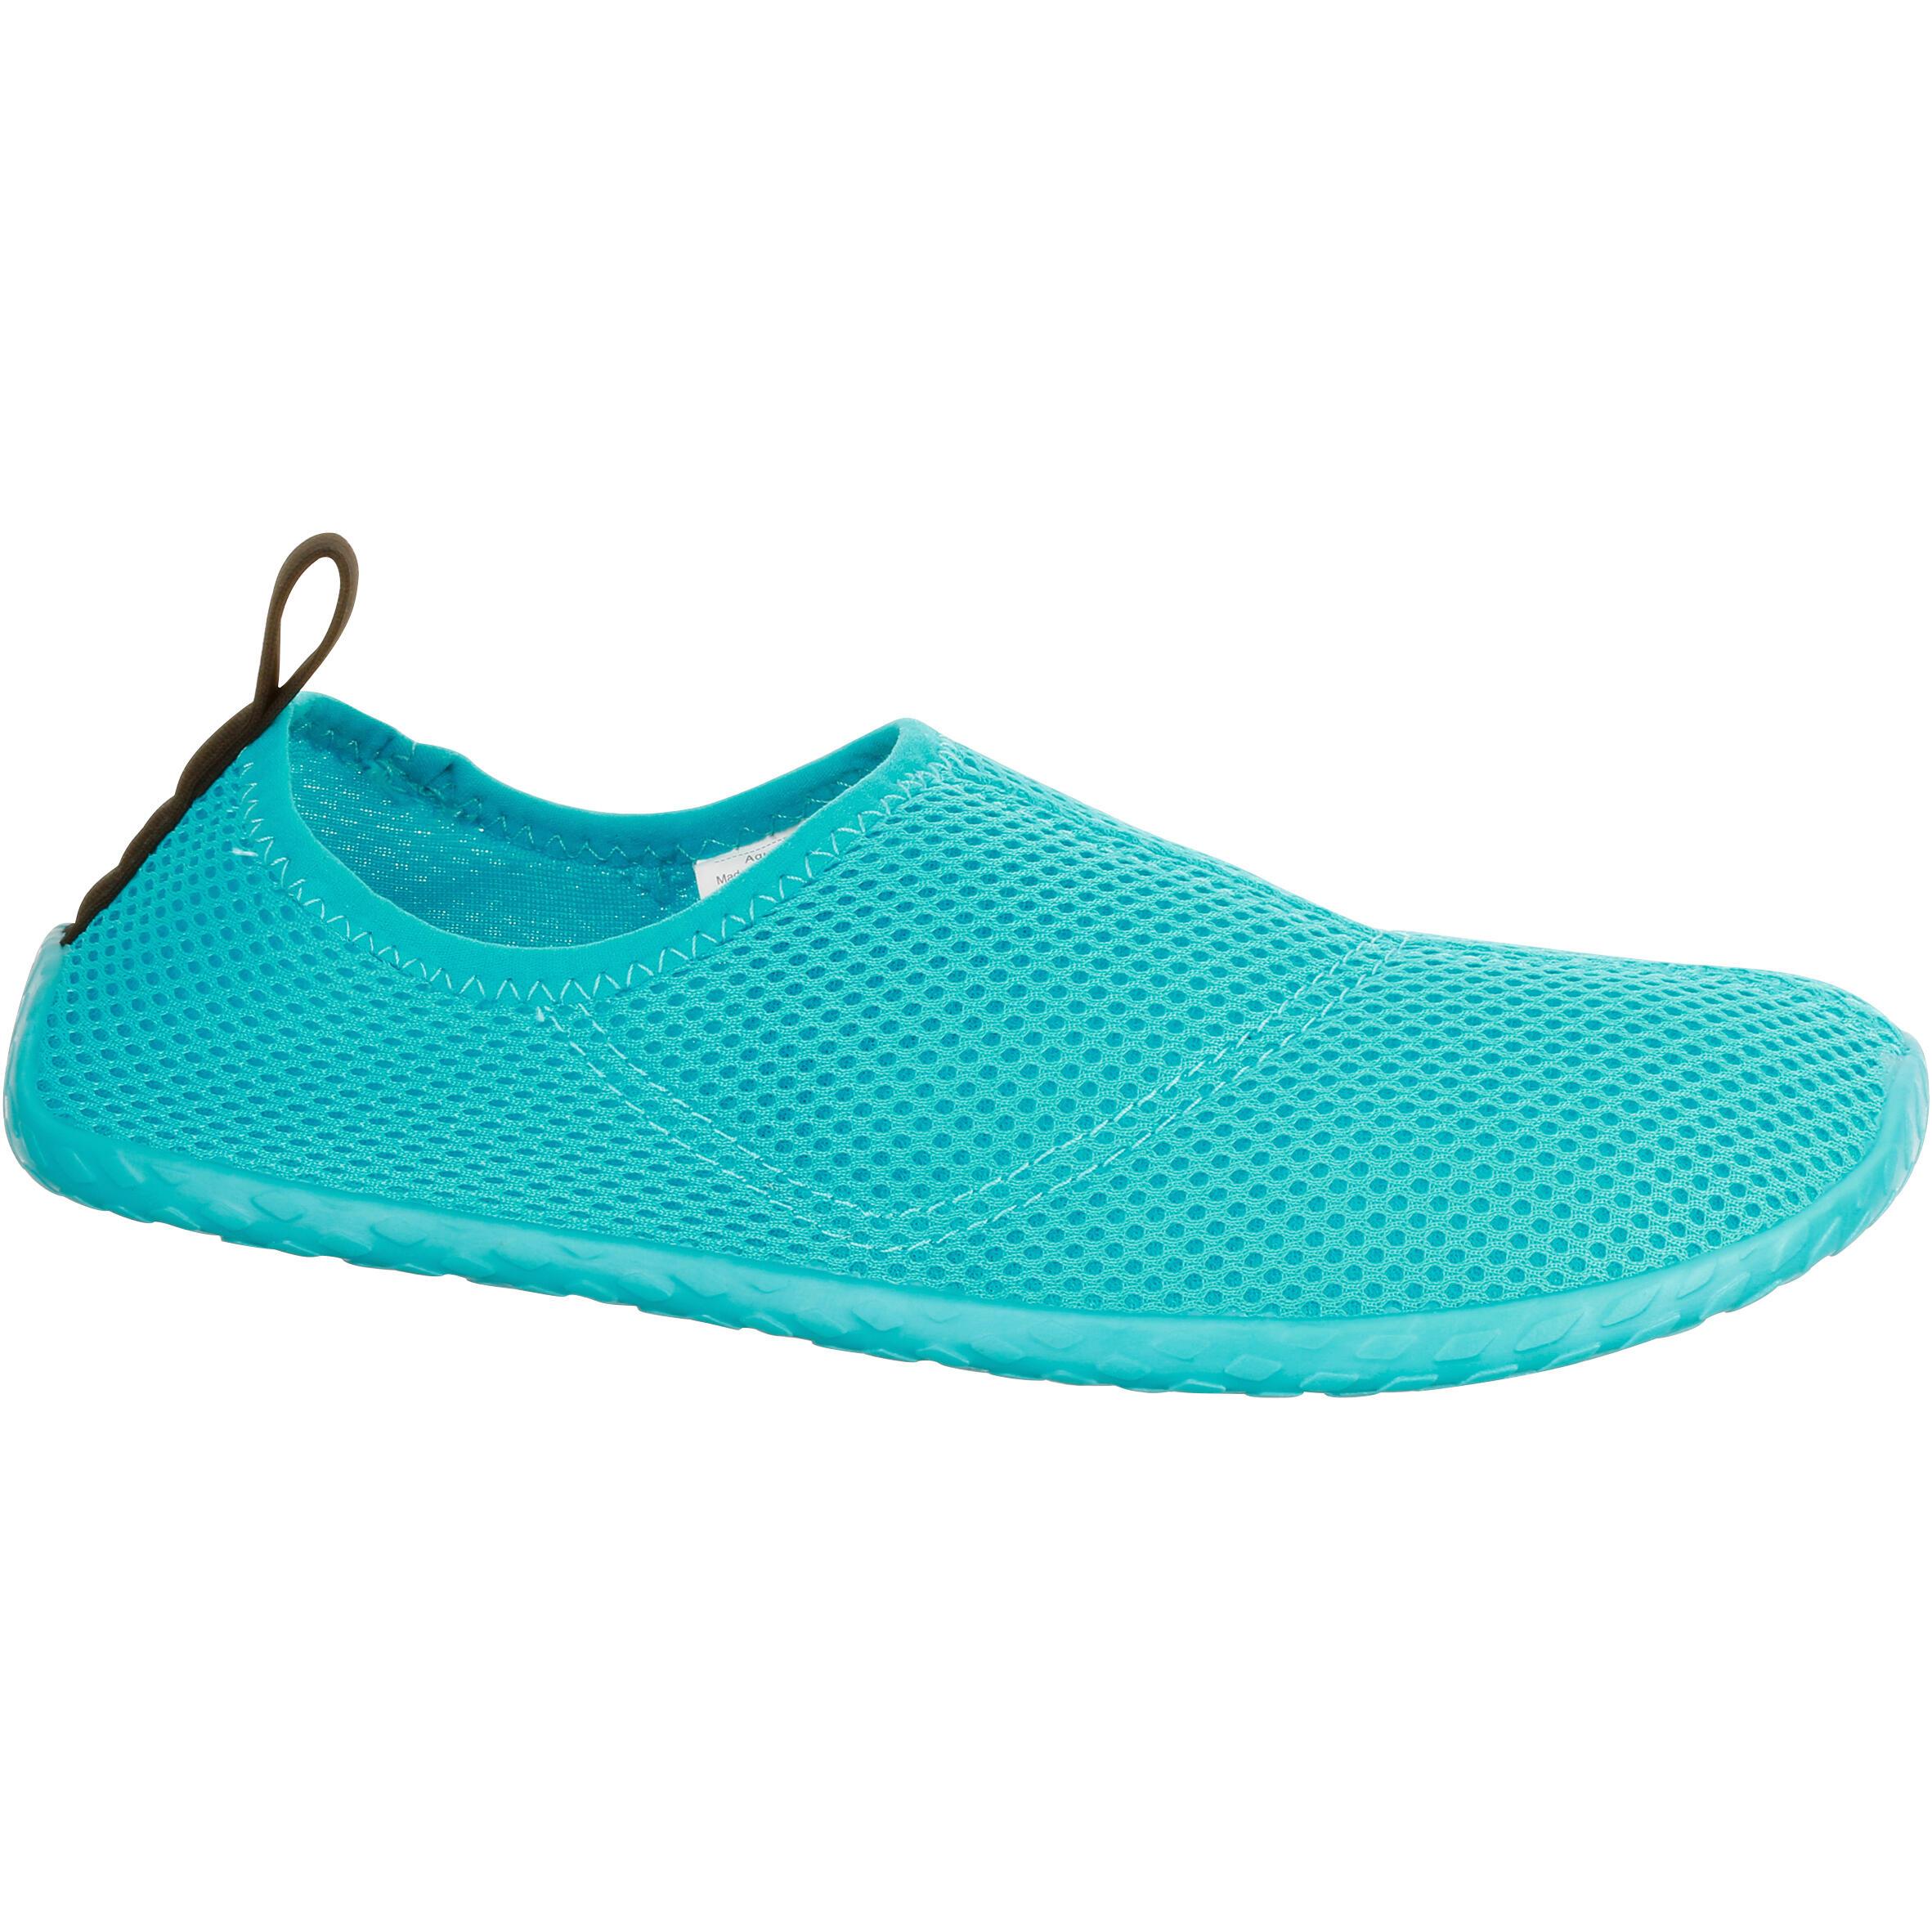 Tenis acuáticos Aquashoes 50 azul turquesa